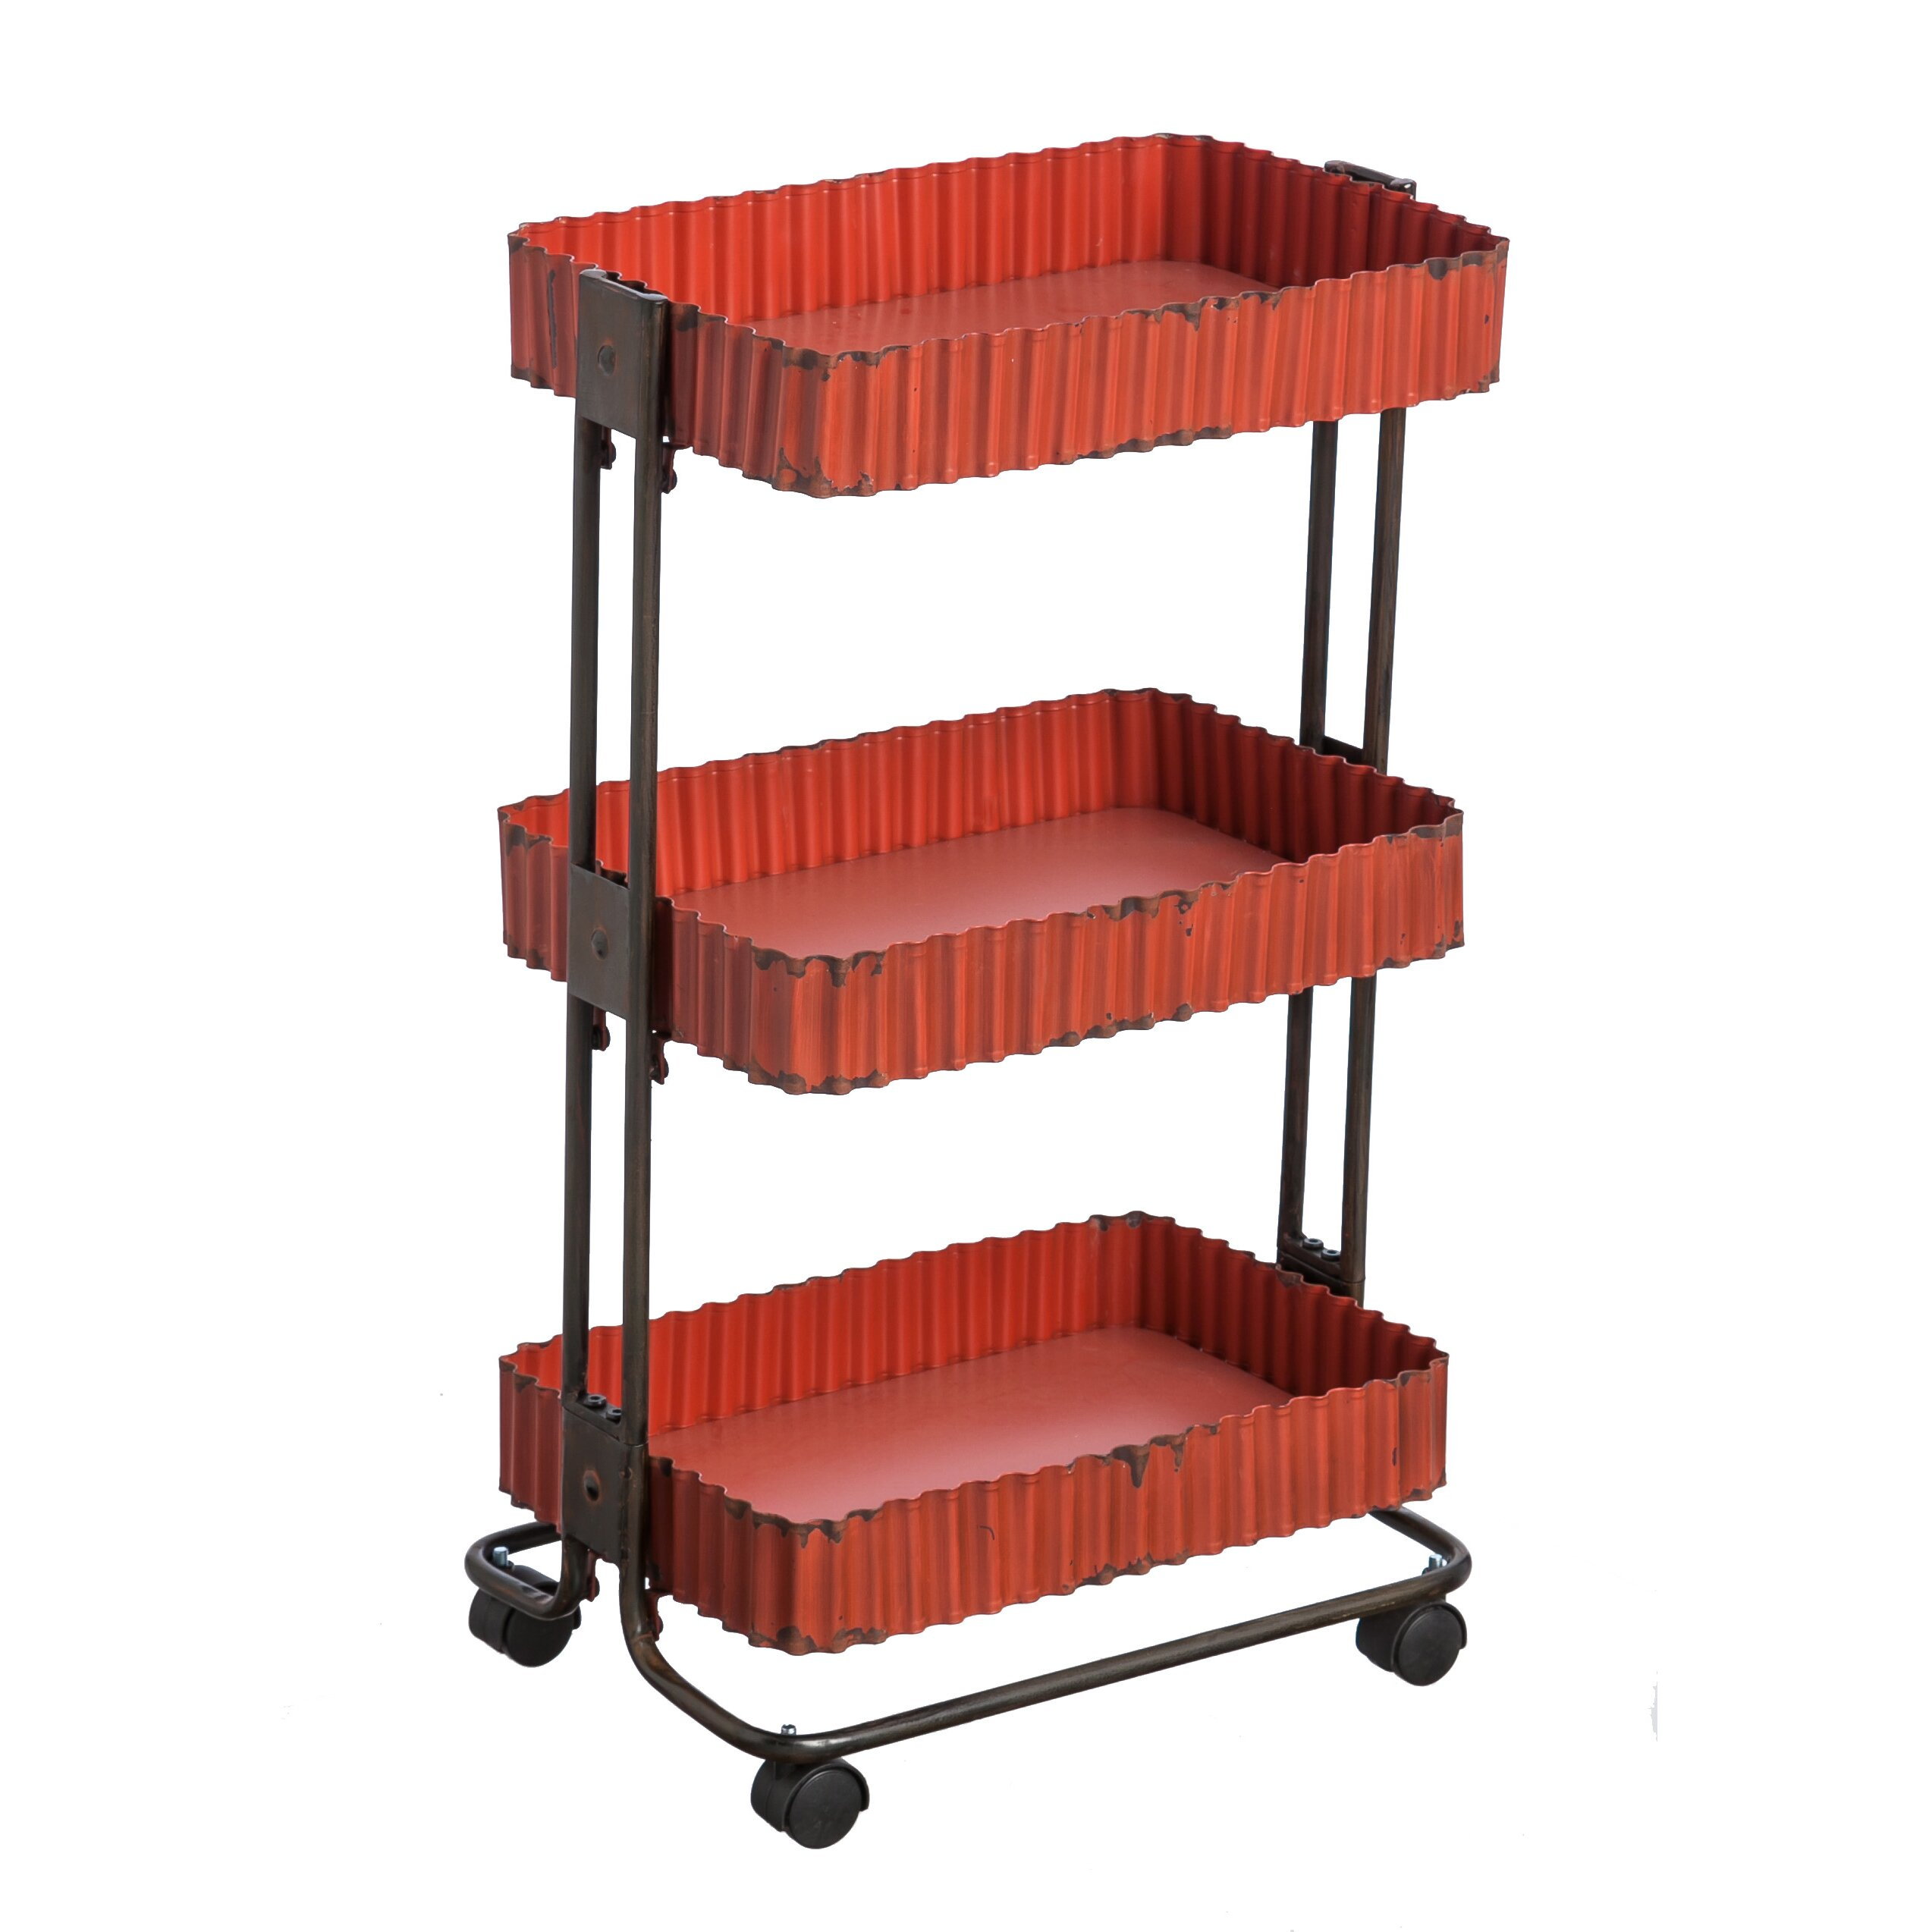 Evergreen Enterprises Inc 3 Tier Metal Utility Cart